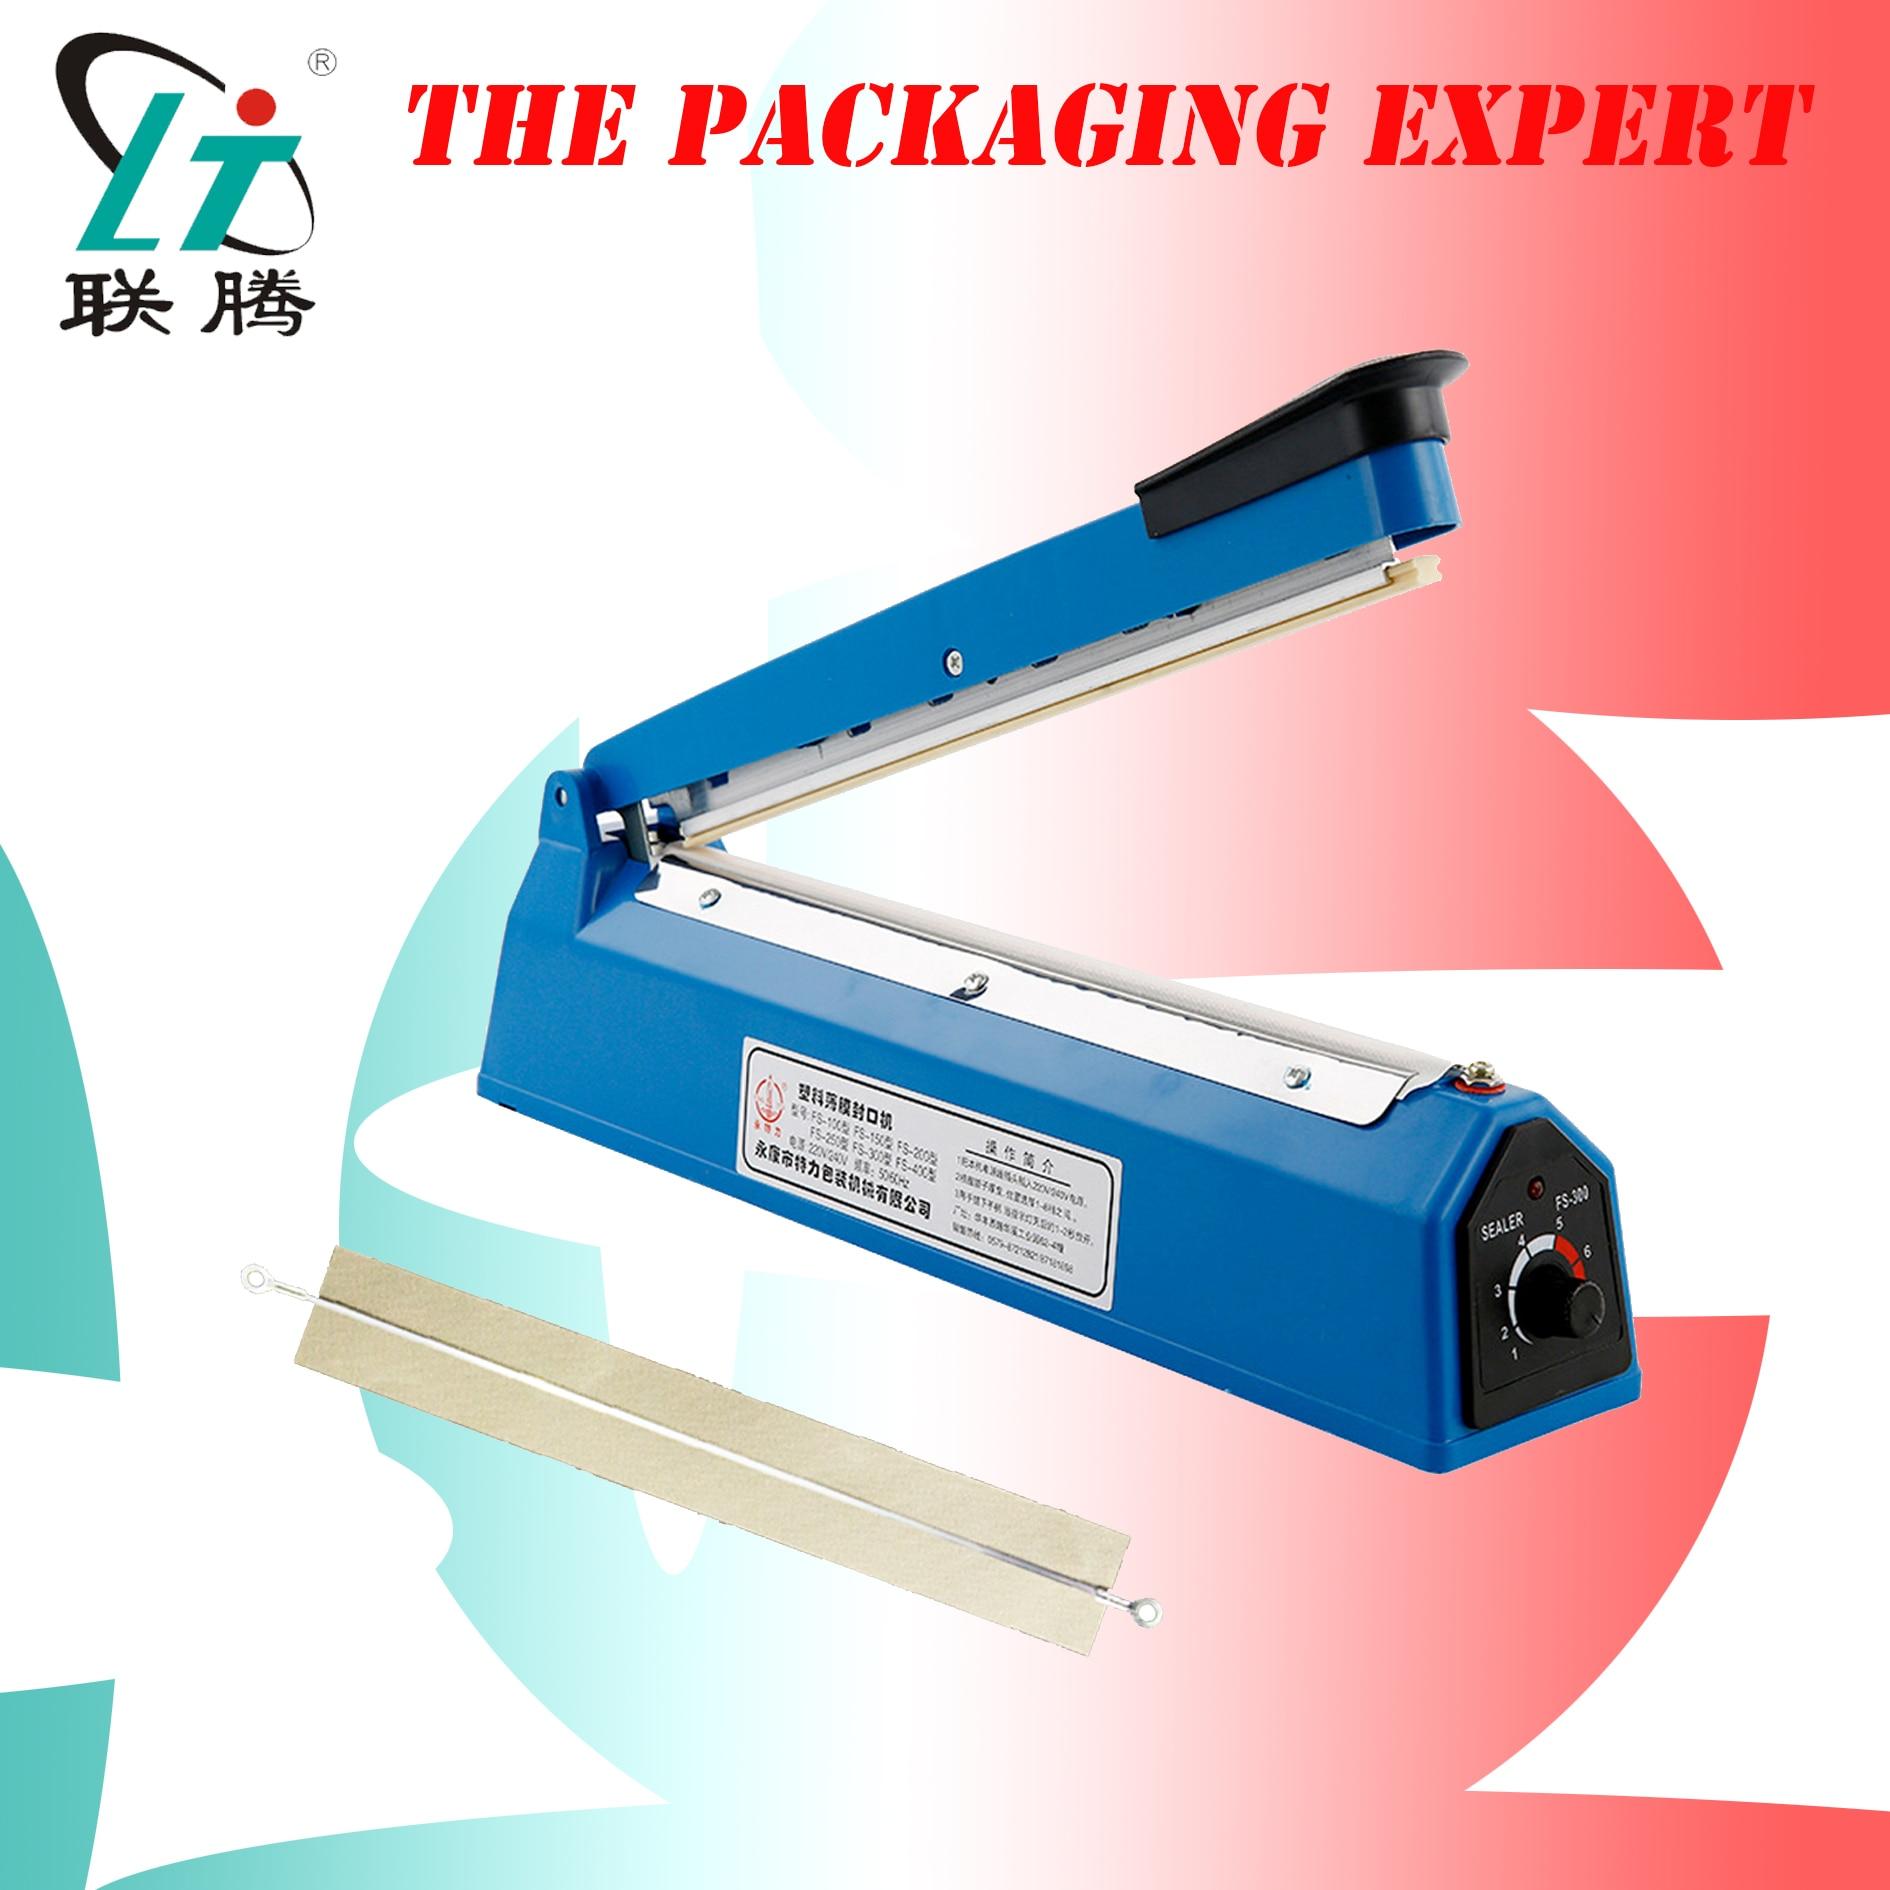 Hand Pressing Pouch Sealer Manual Impulse Sealing Machine Film Aluminum Plastic Bag Heating Sealer Heat Poly Bag Free Shipping